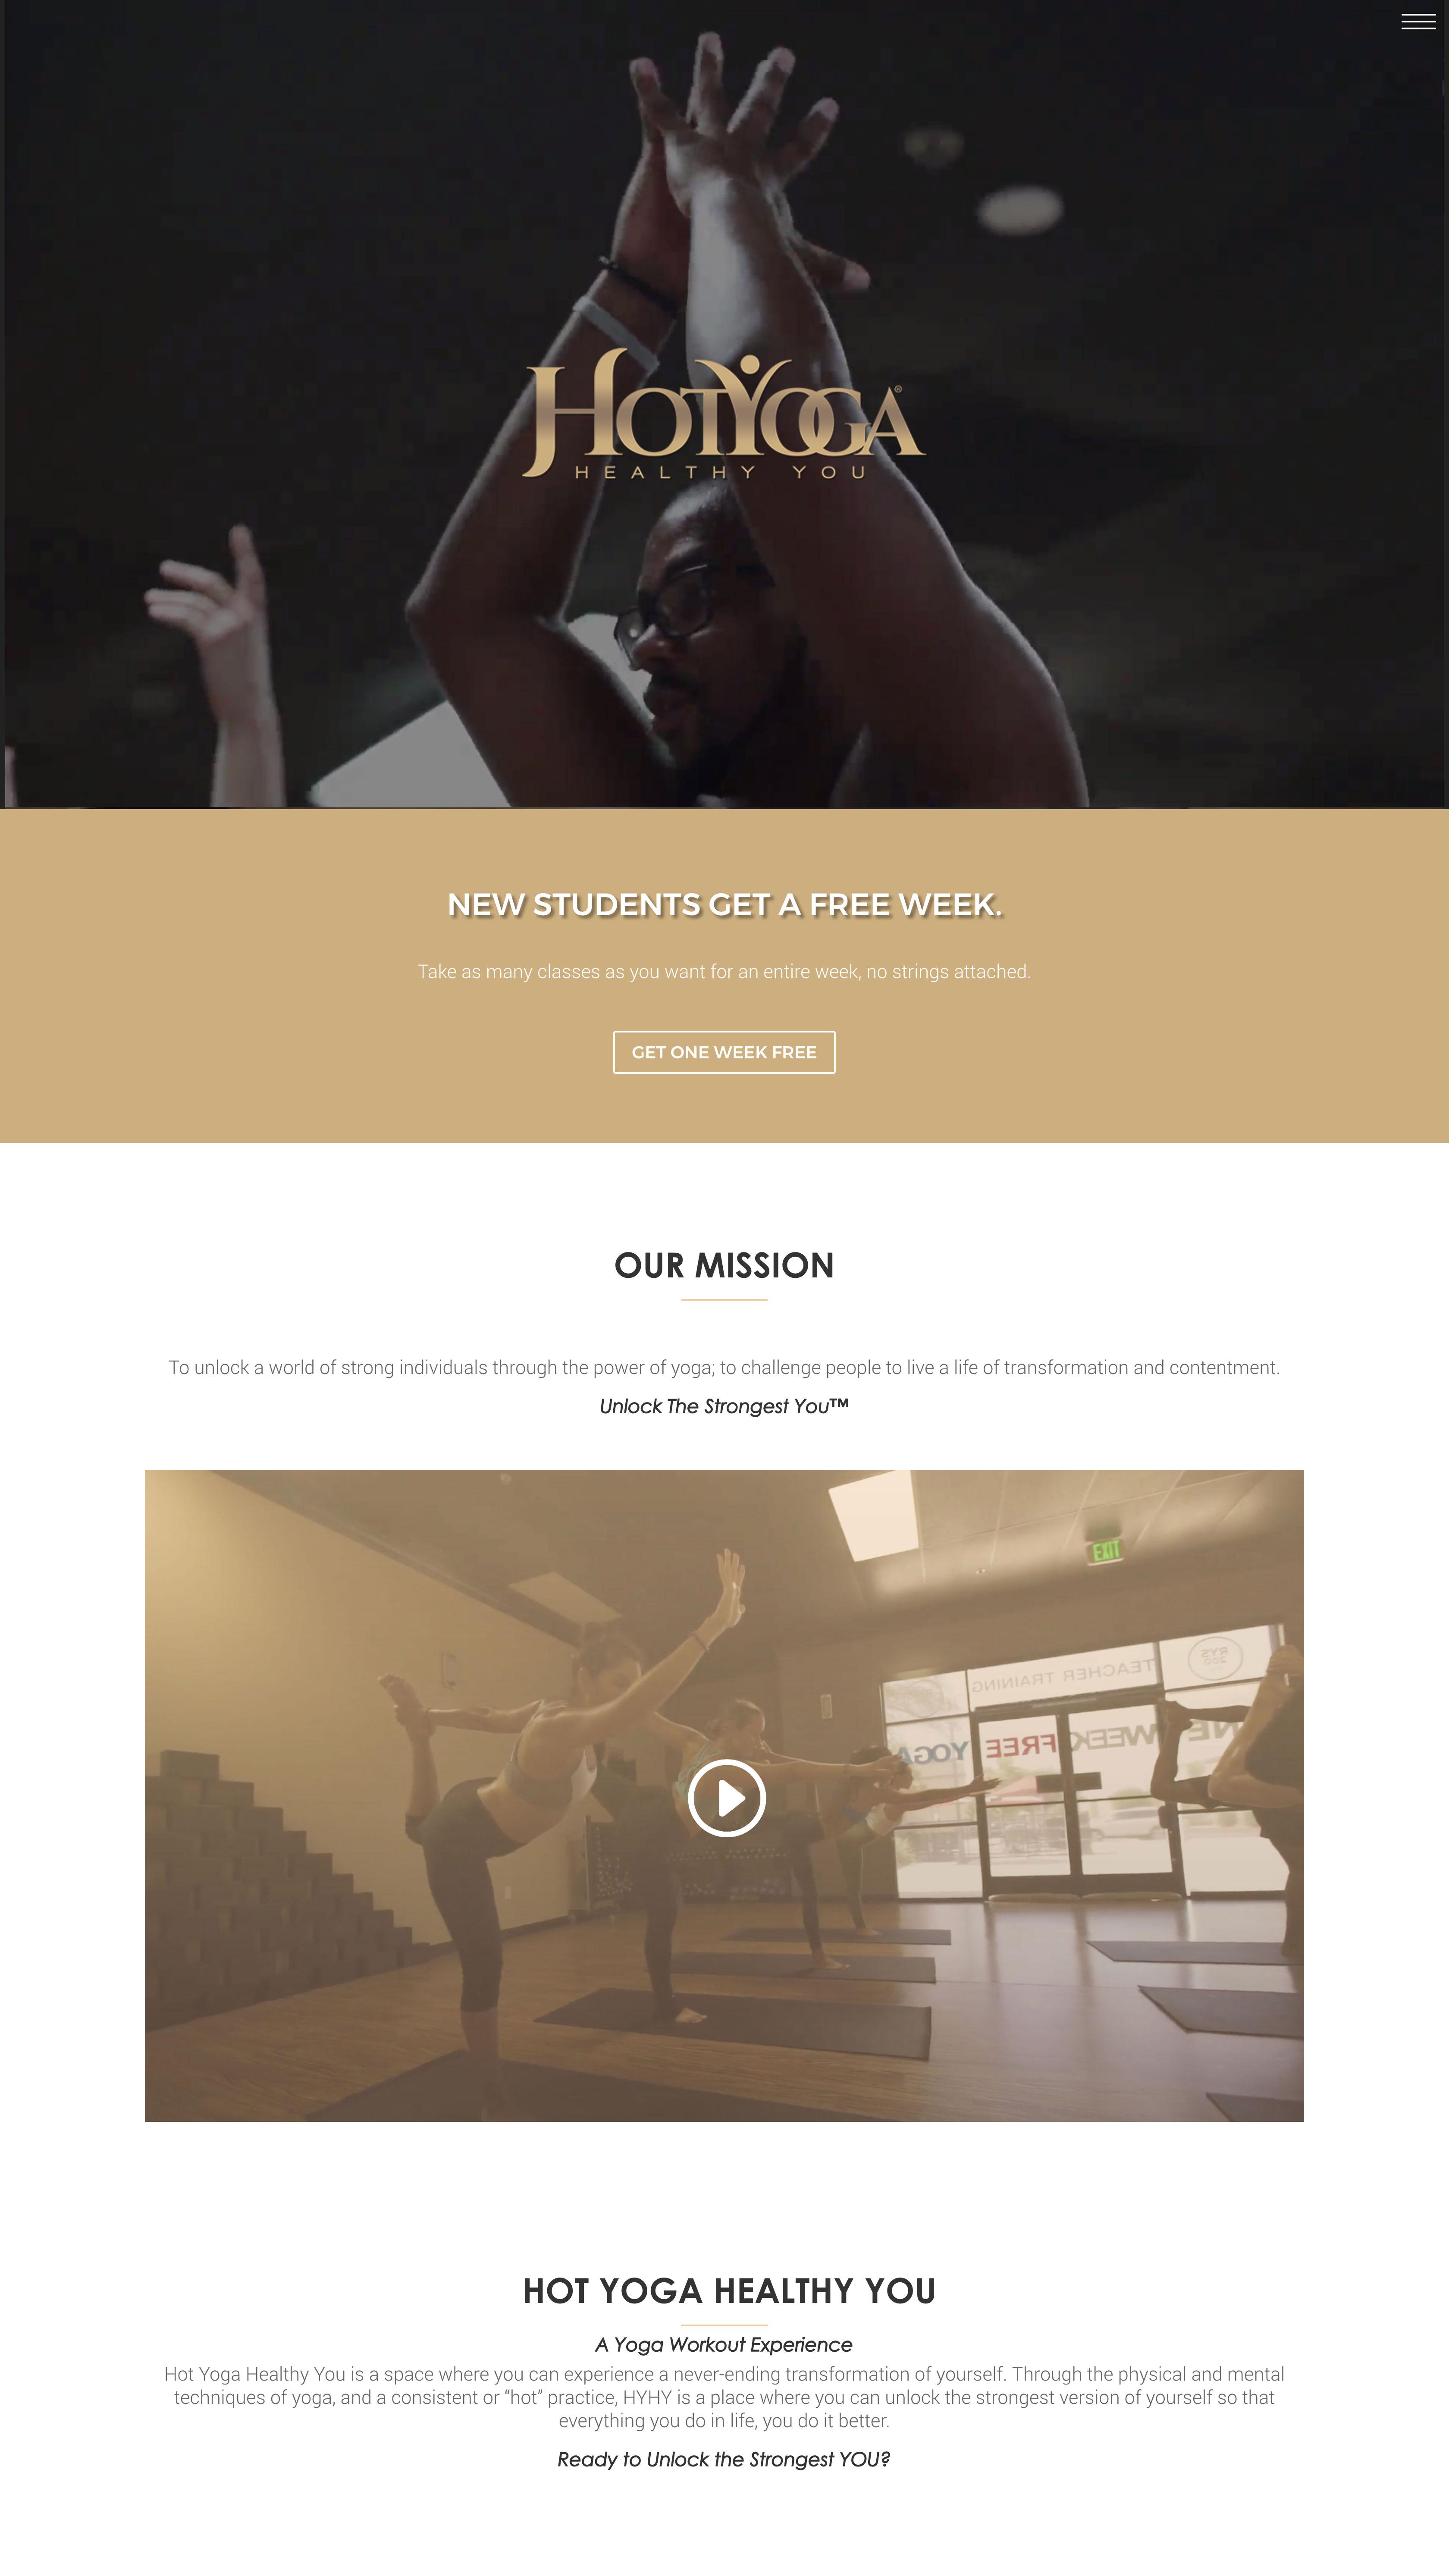 Hot Yoga Healthy You by Post Oak Agency